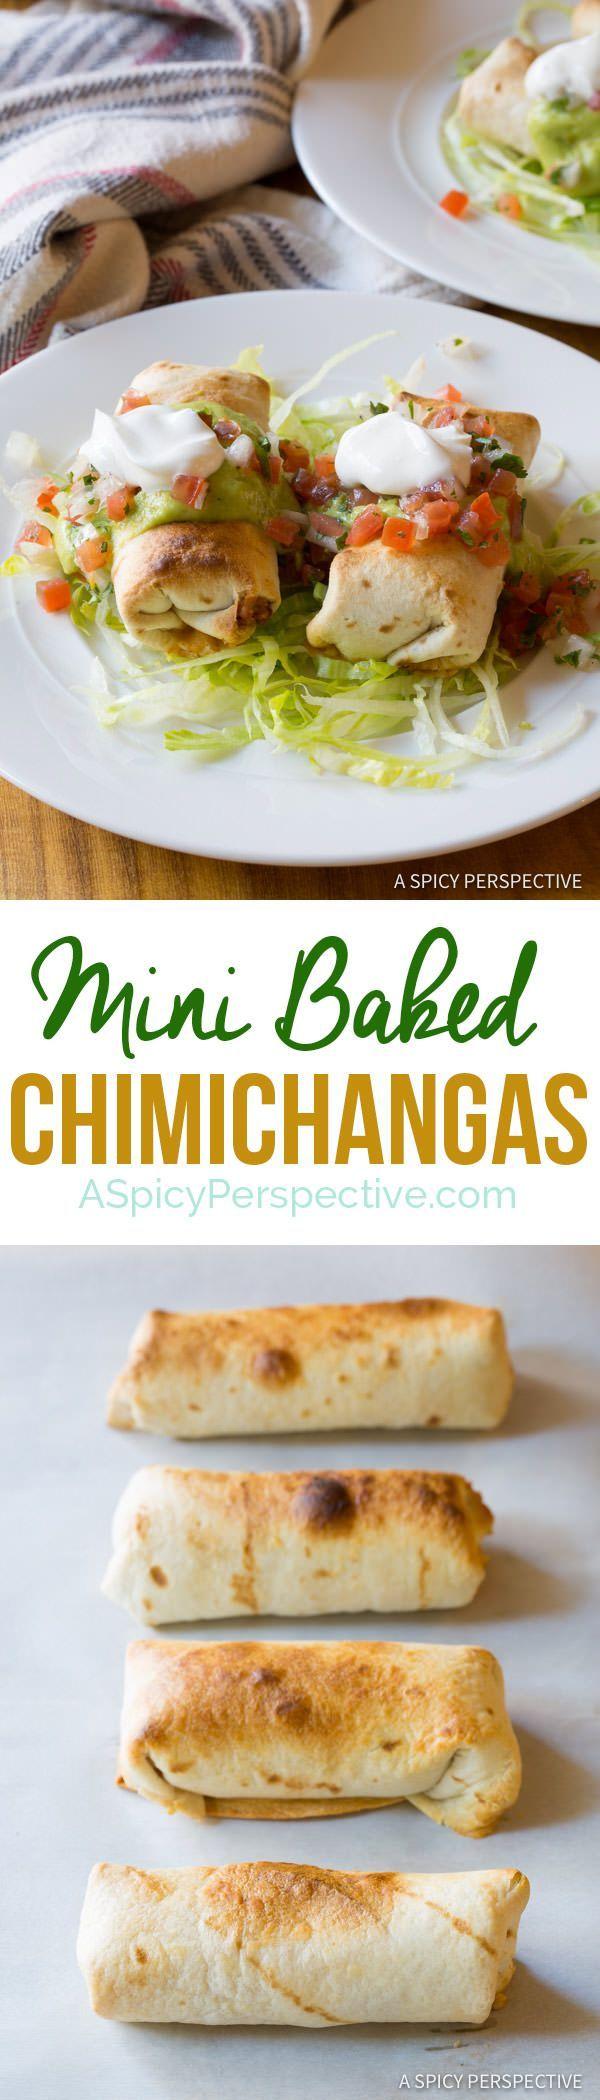 Lightened-Up Mini Baked Chimichanga Recipe | http://ASpicyPerspective.com